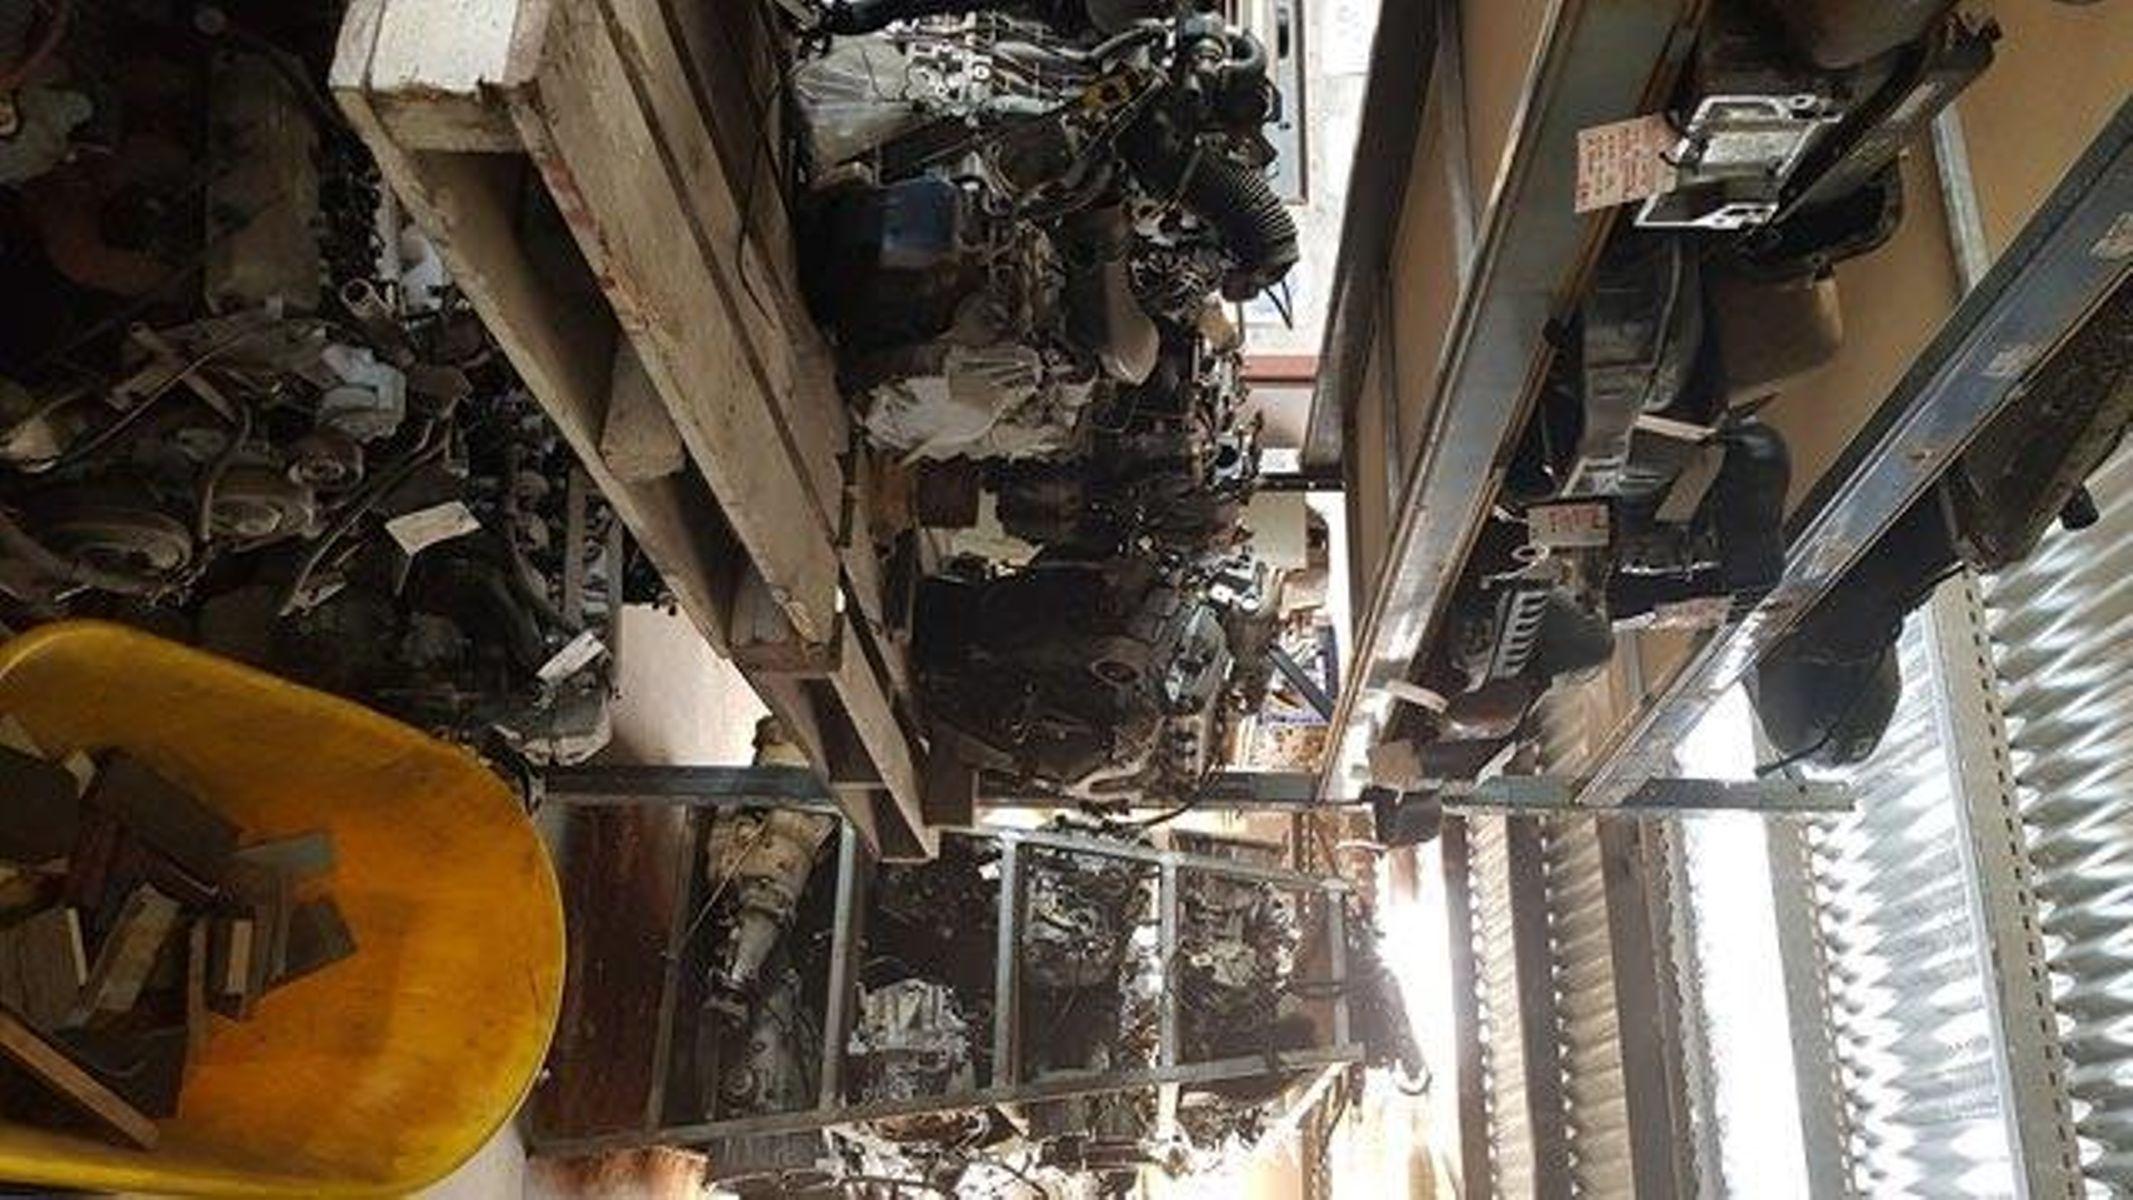 96 Old Bar Road - APC Auto Wreckers, Taree, NSW 2430